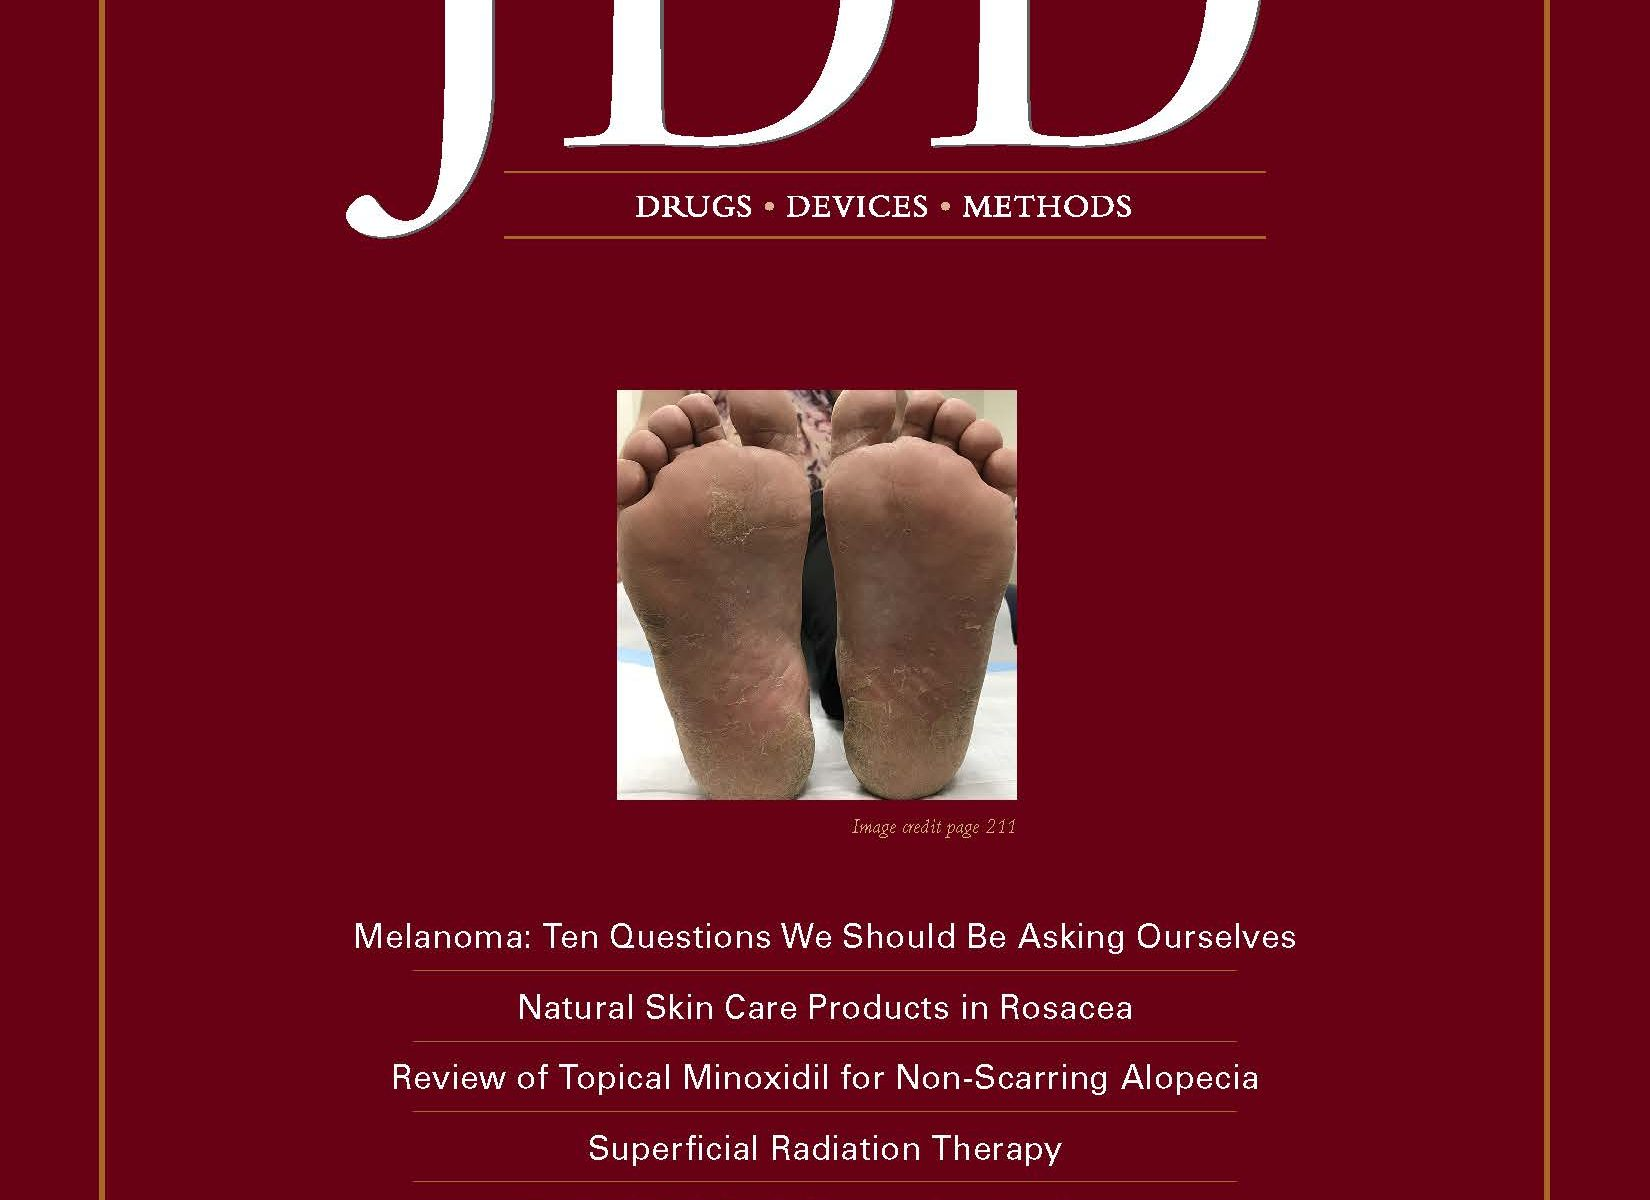 JDD February Issue